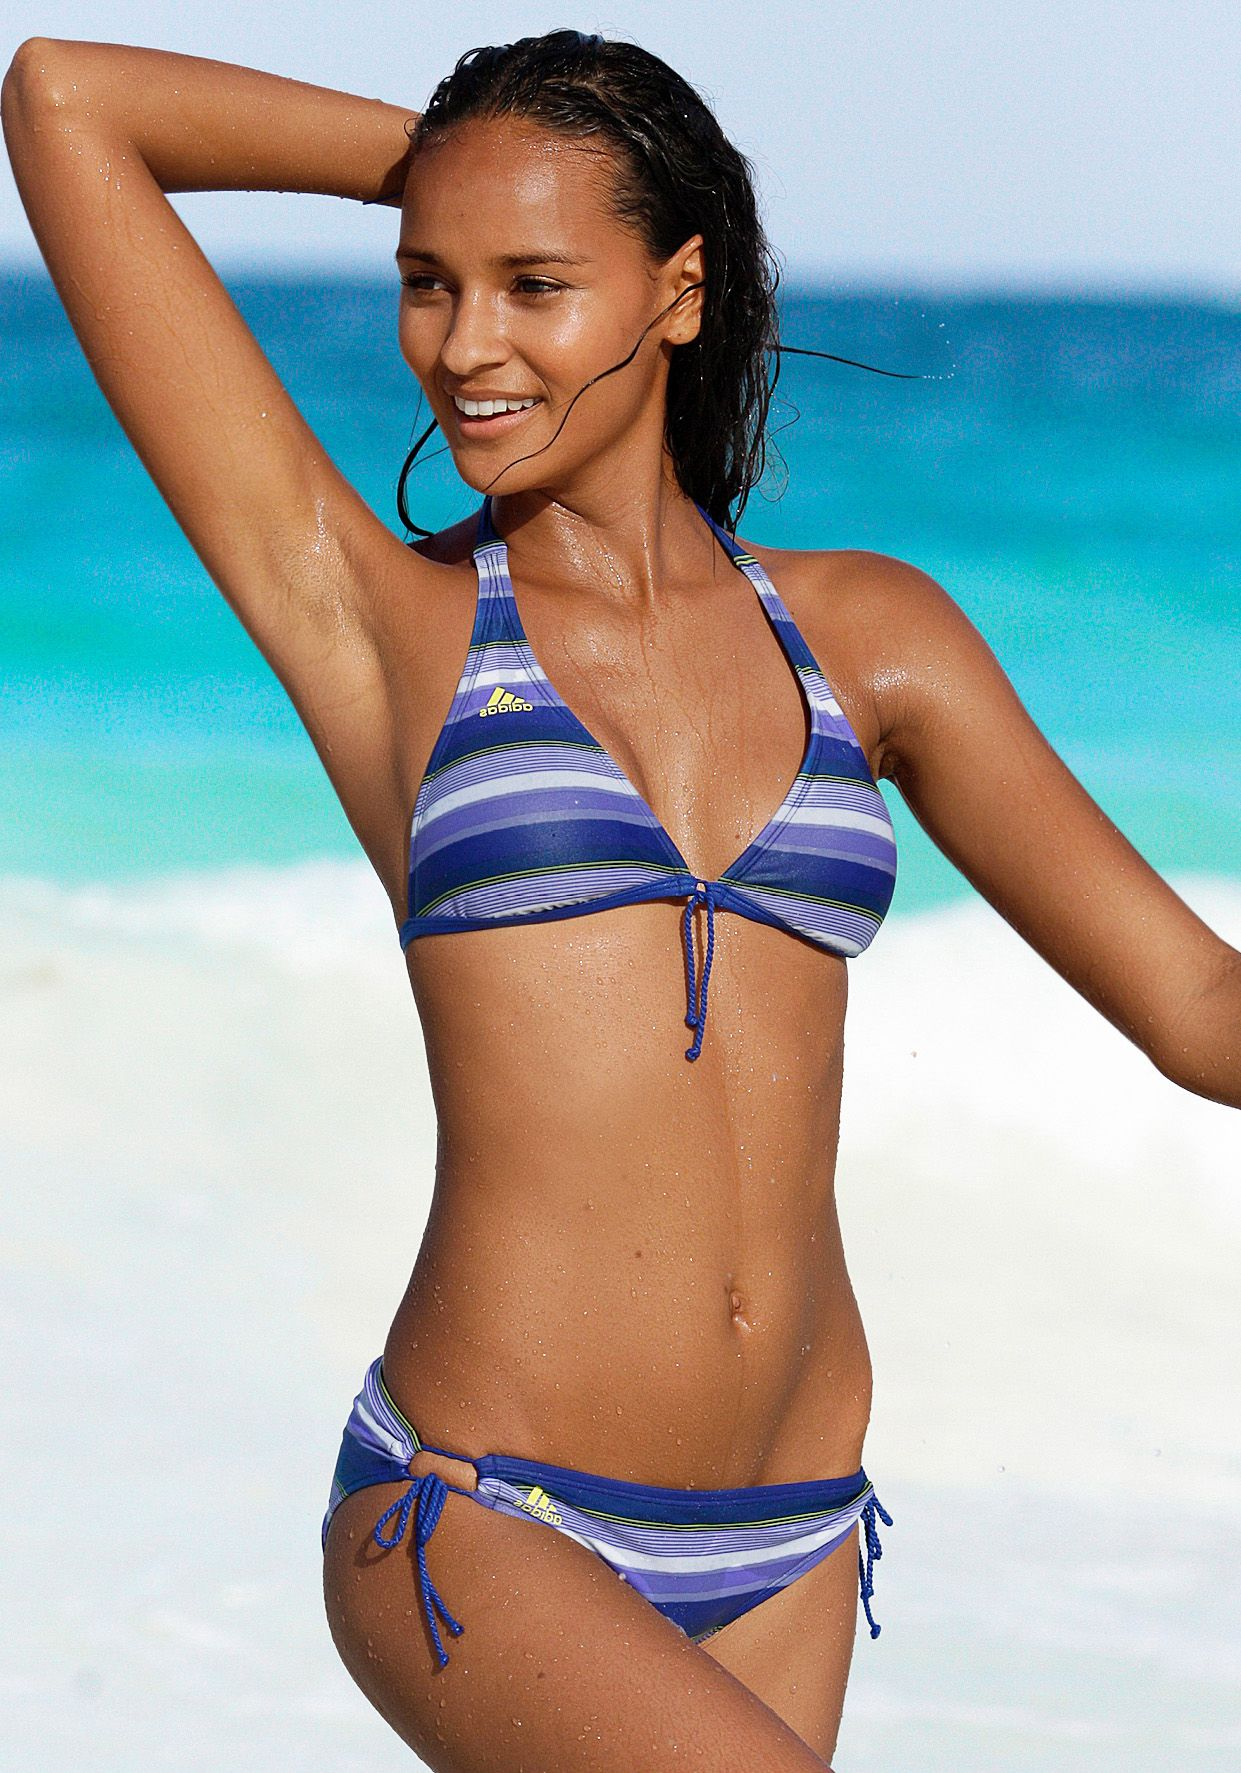 ADIDAS PERFORMANCE Triangel-Bikini, adidas Performance blau gestreift blau gestreift 34;36;38;40;42 blau